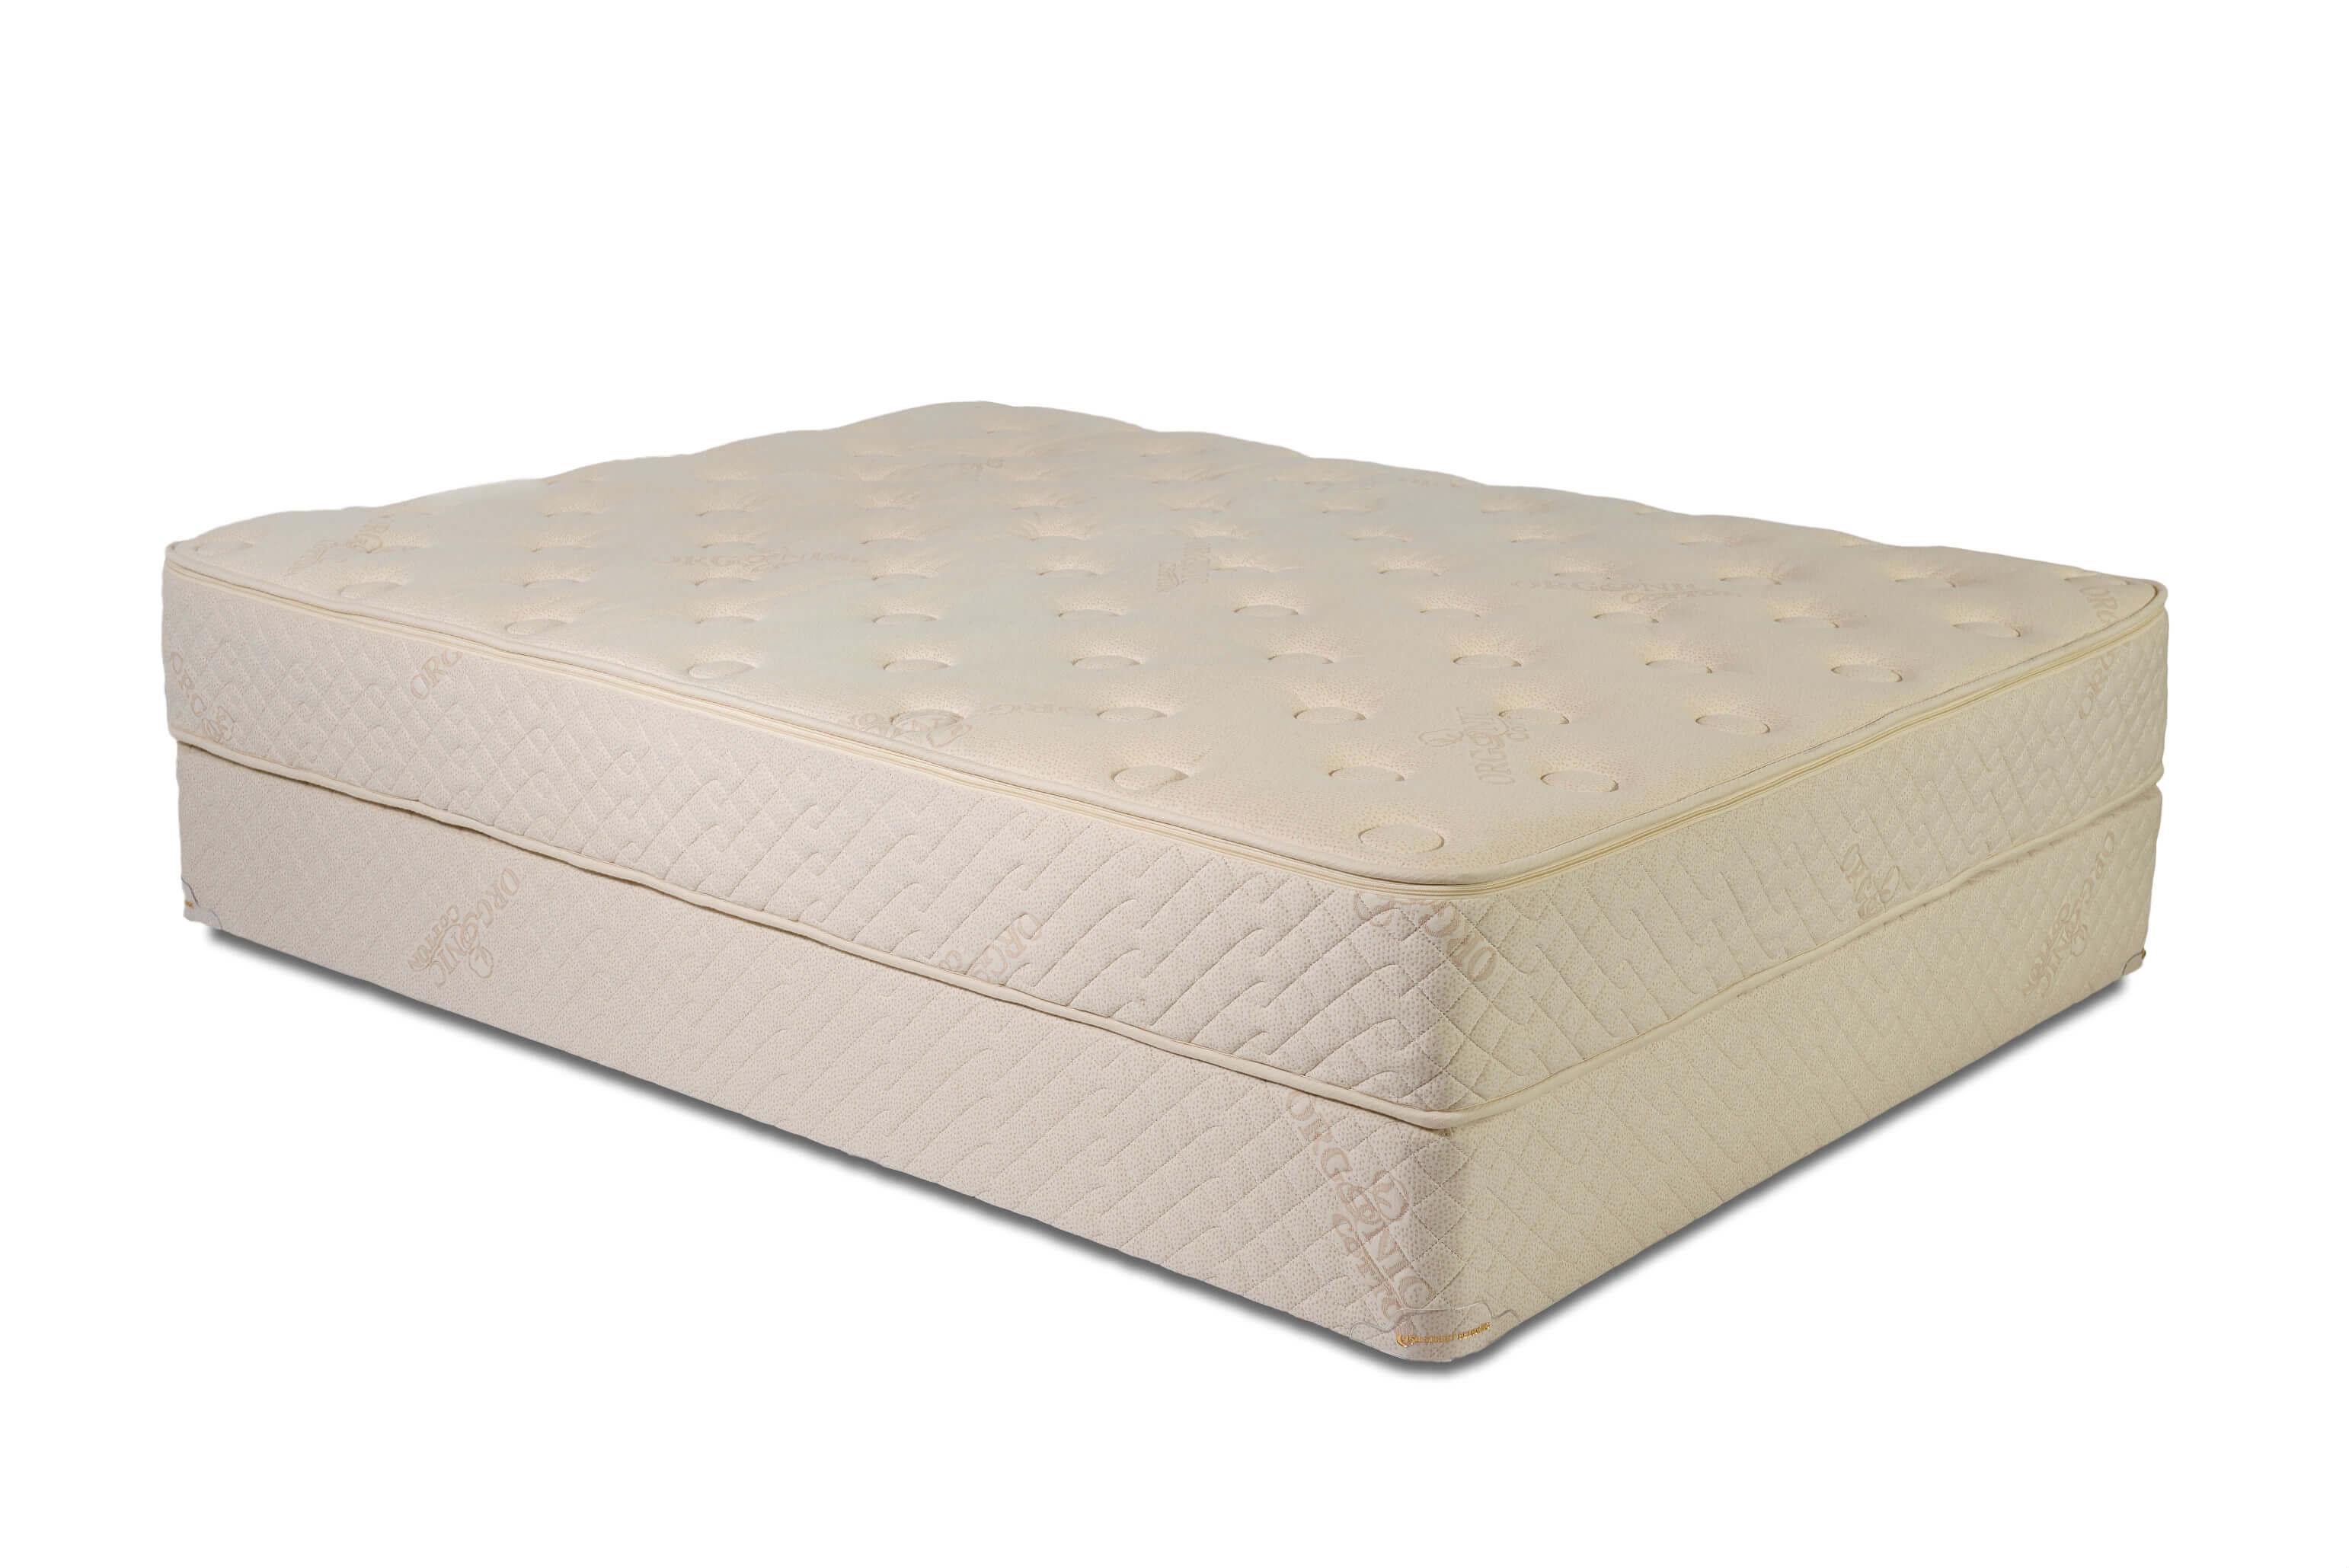 carkeek s jordan bedroom mattress seattle furniture mattresses side oregon company innerspring by products